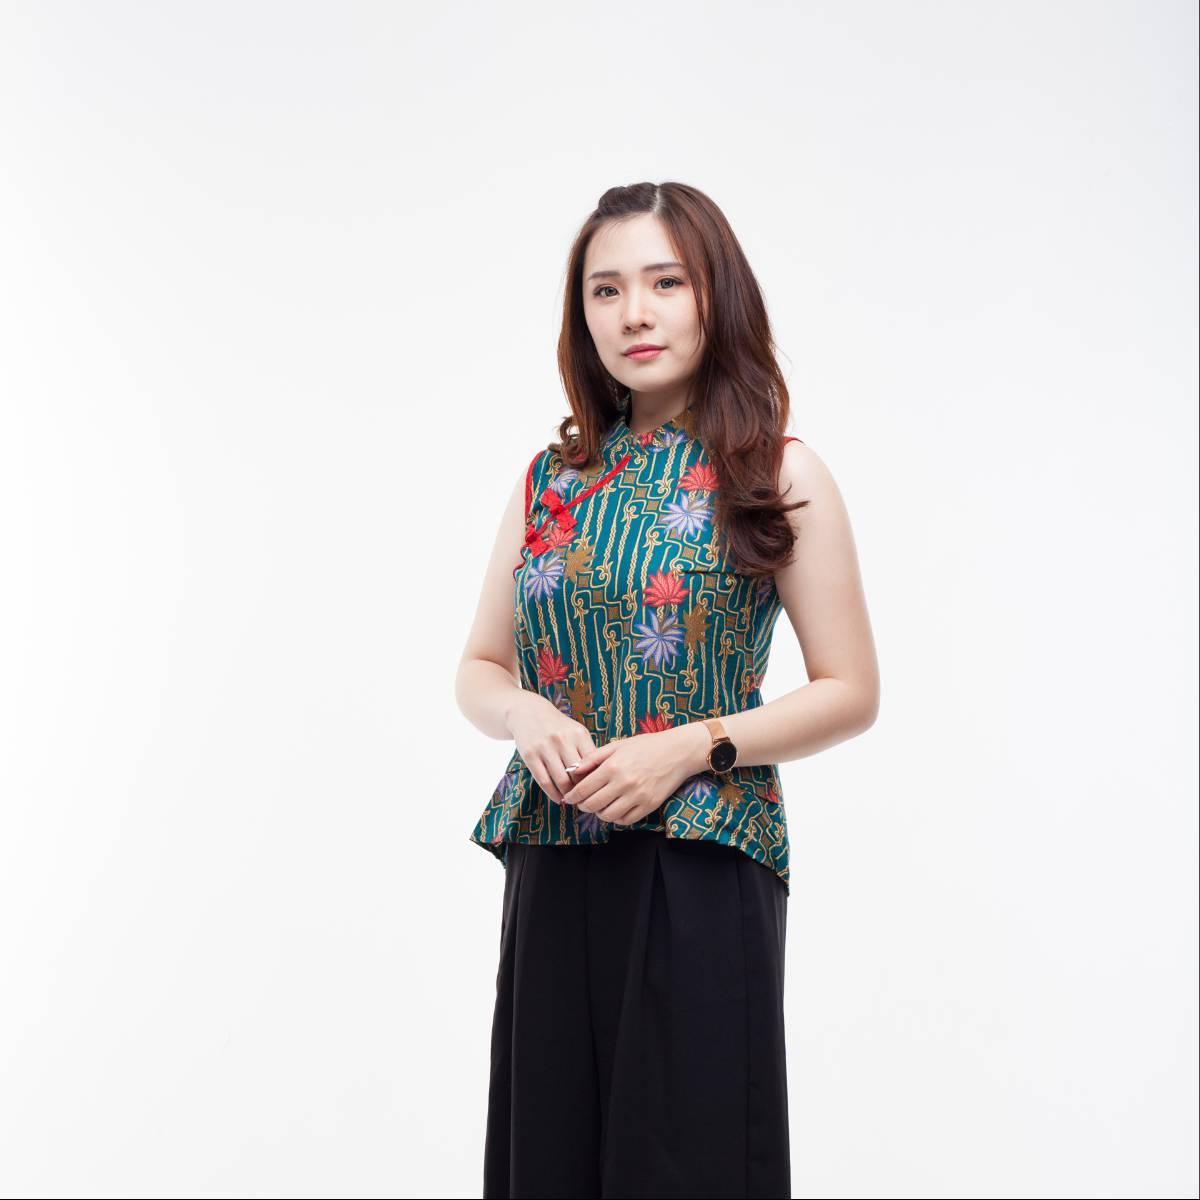 Atasan Batik Wanita Modern - Amel Top1